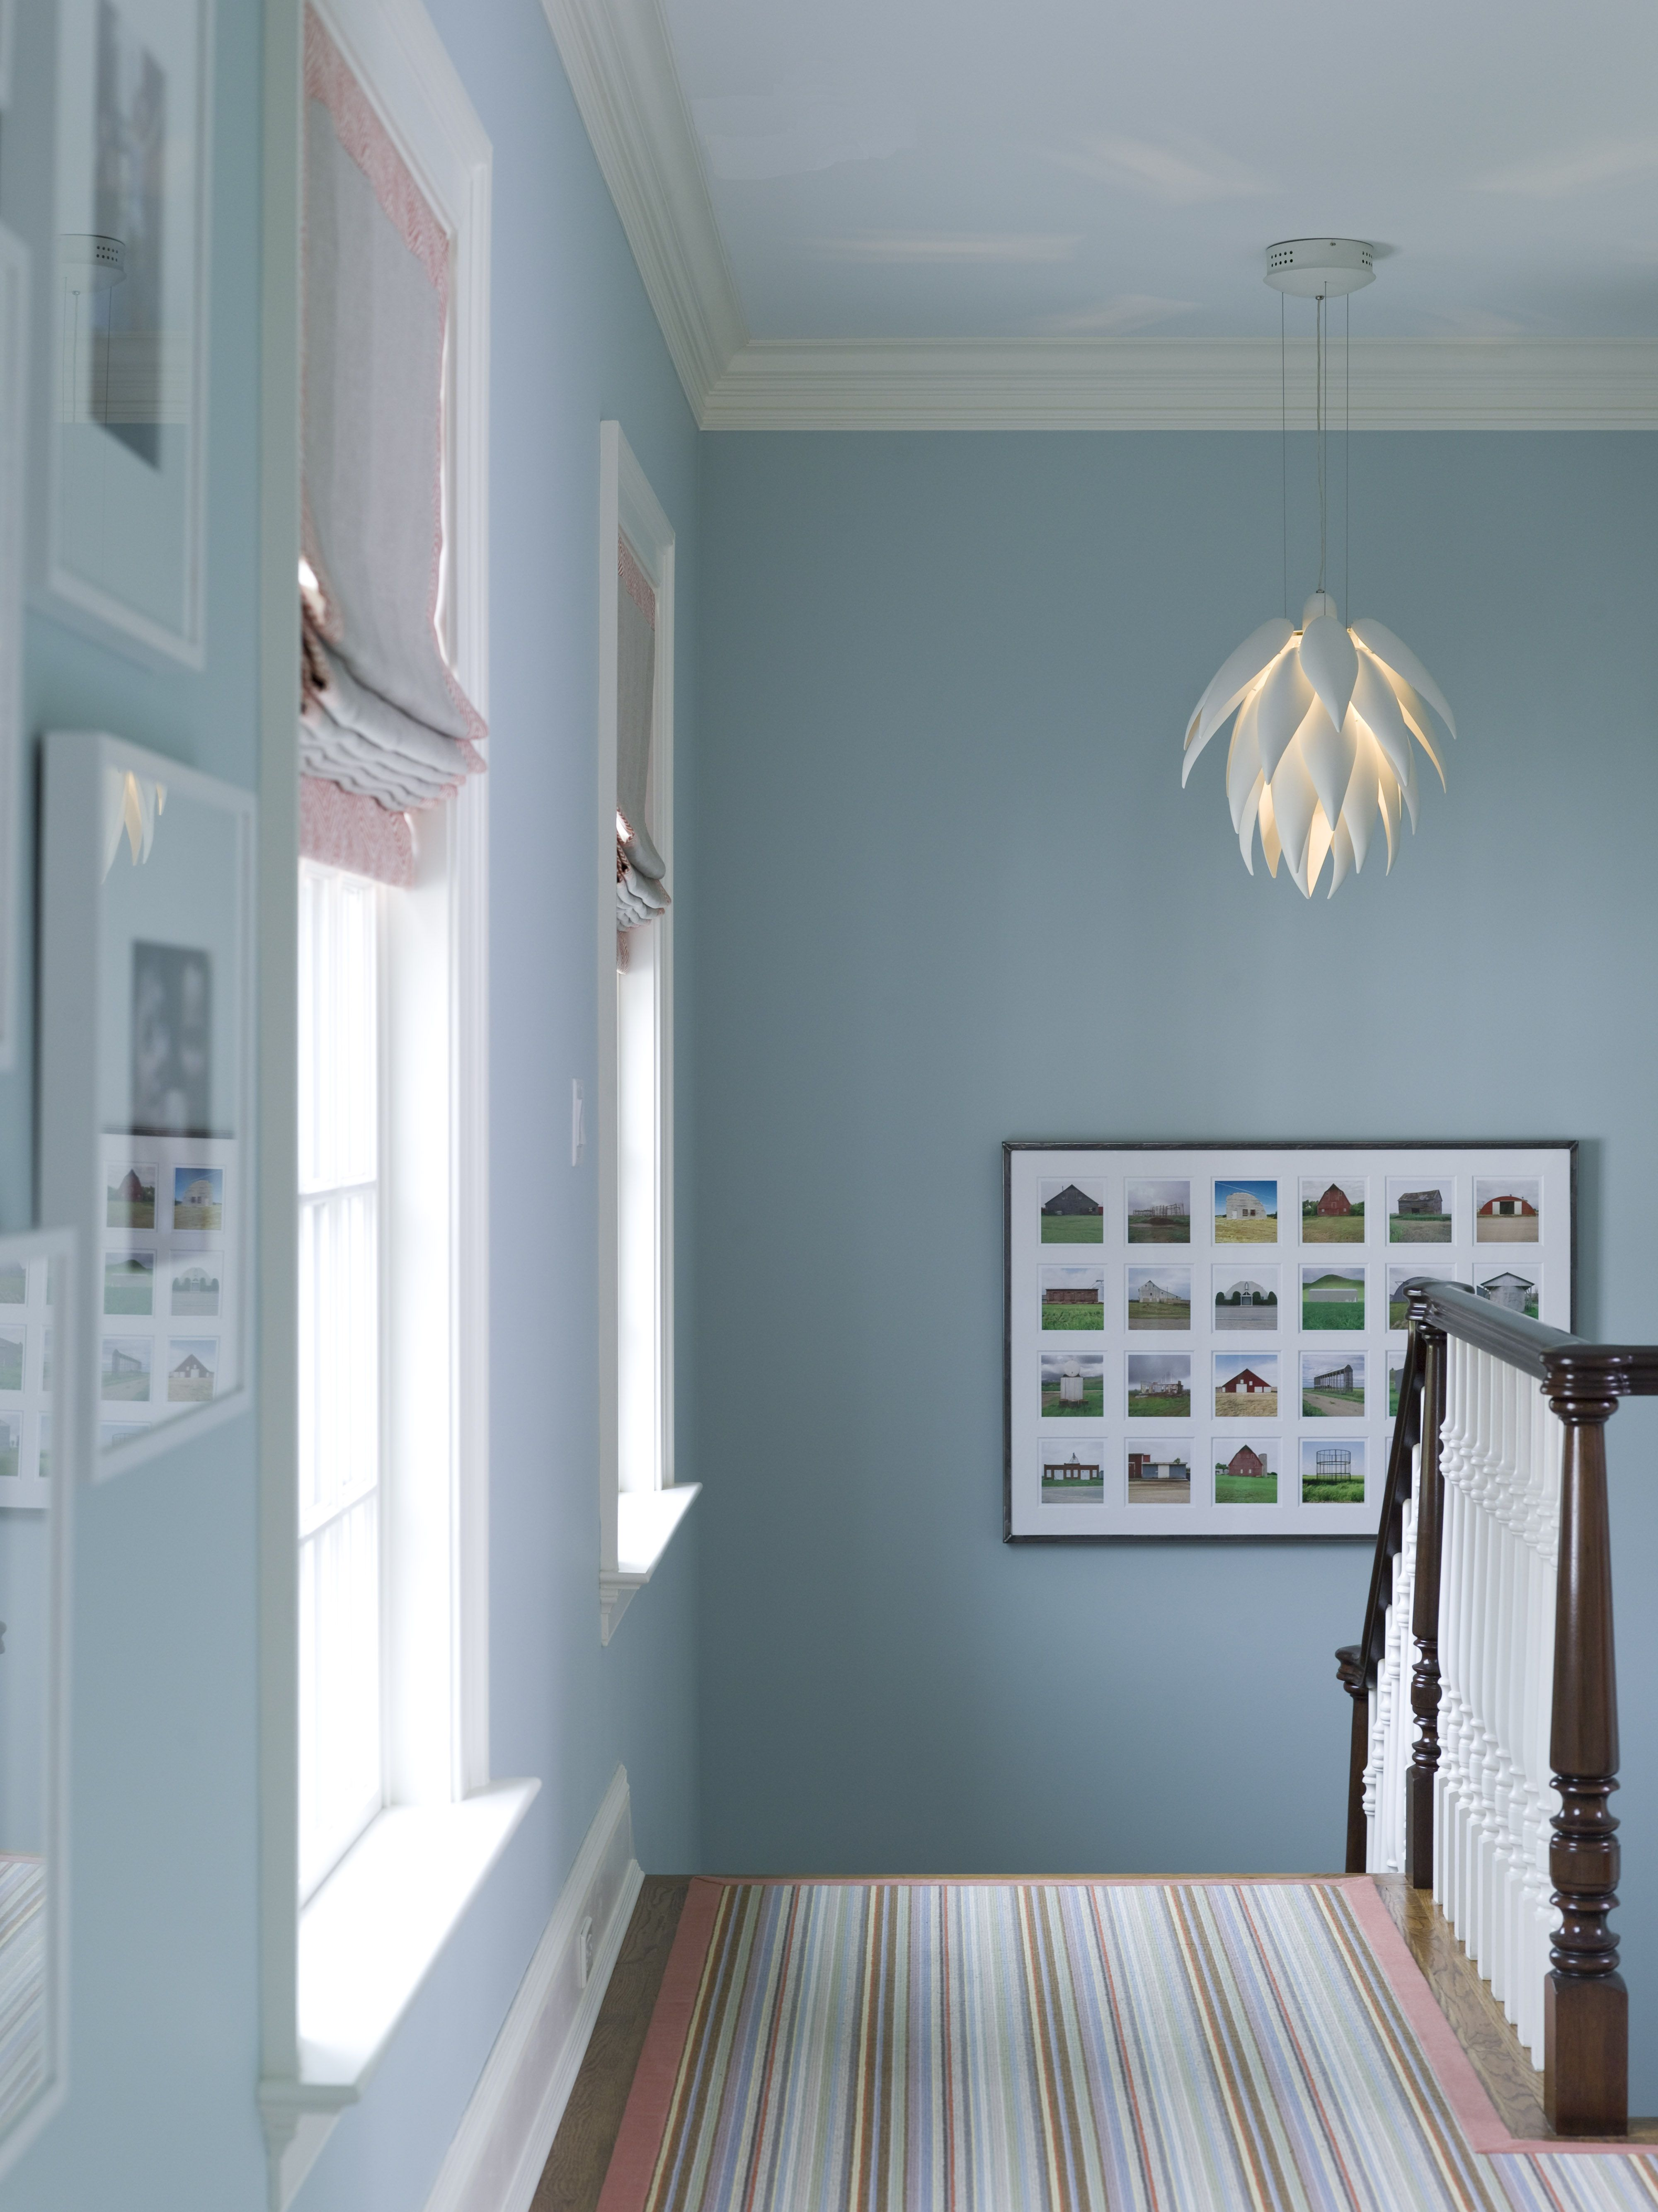 country estate interior design litchfield ct in 2020 on designer interior paint colors id=24836